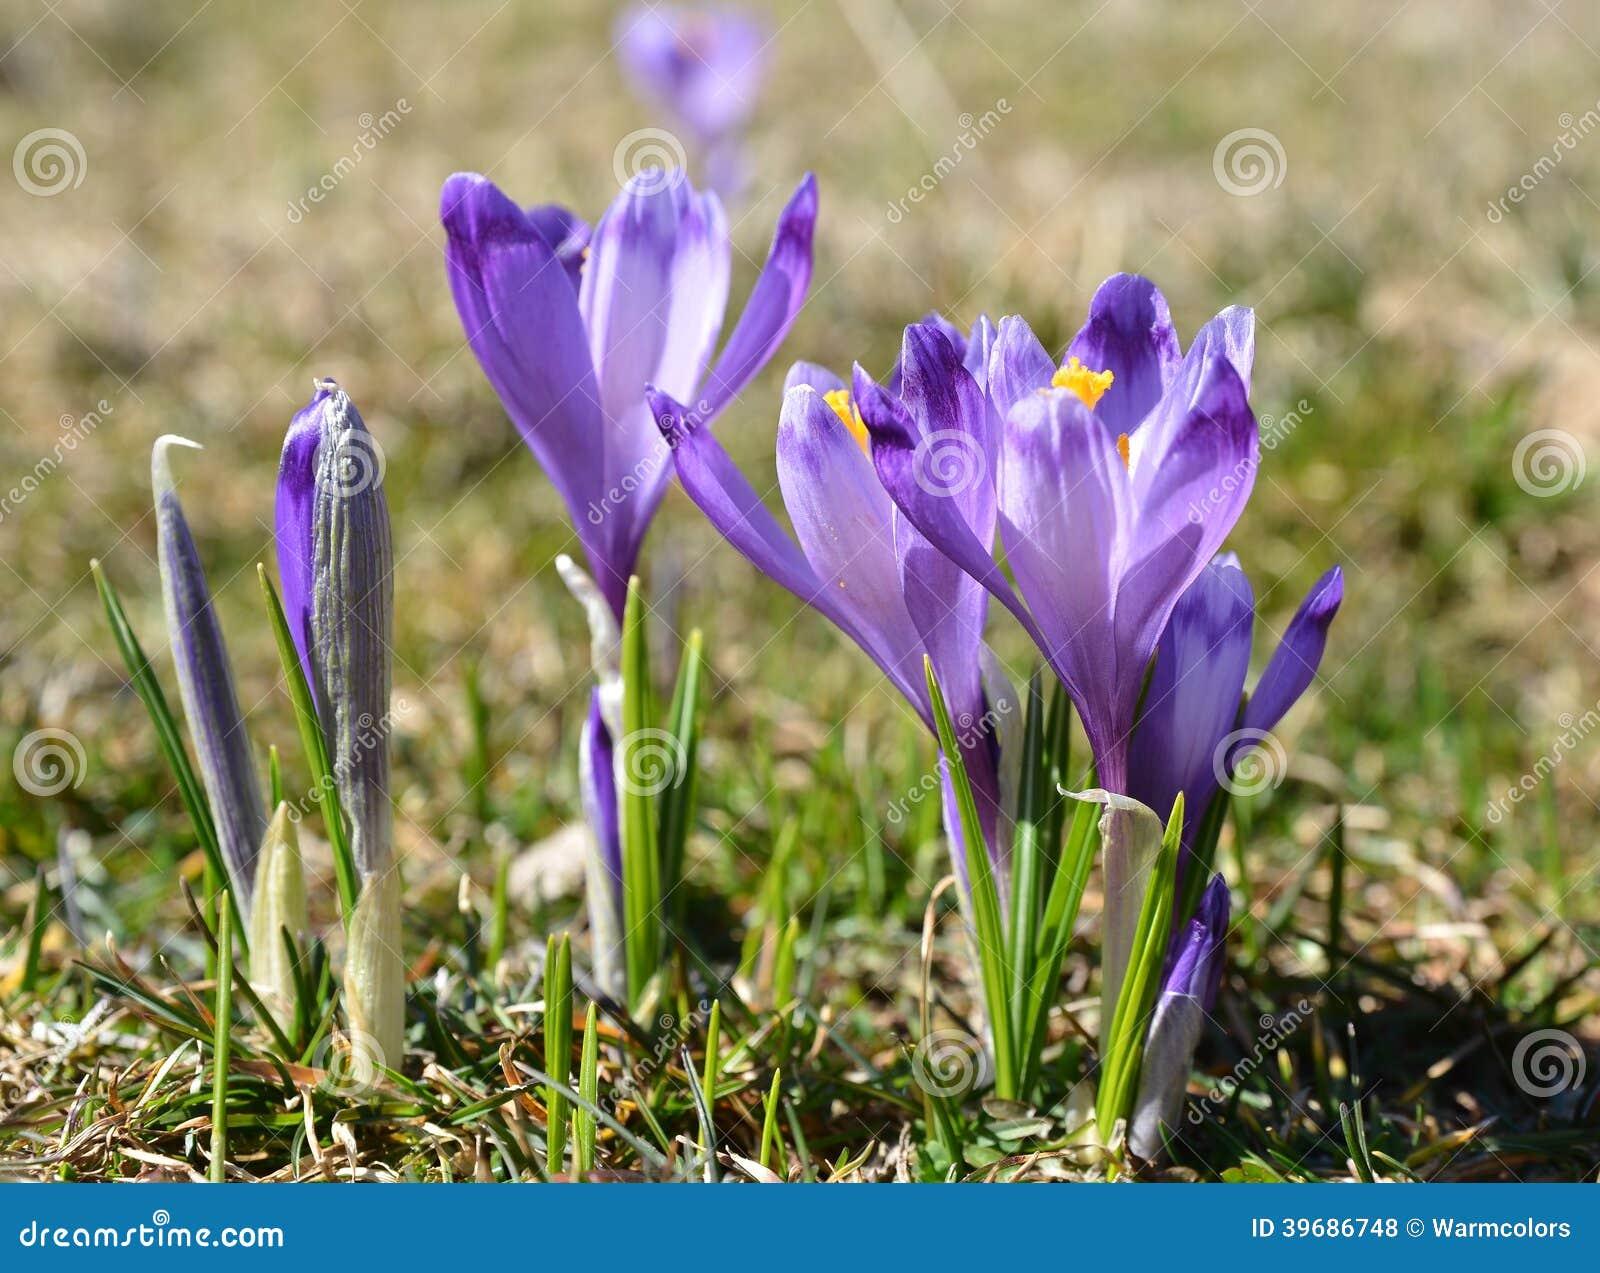 purple early spring flowers wallpapers gallery